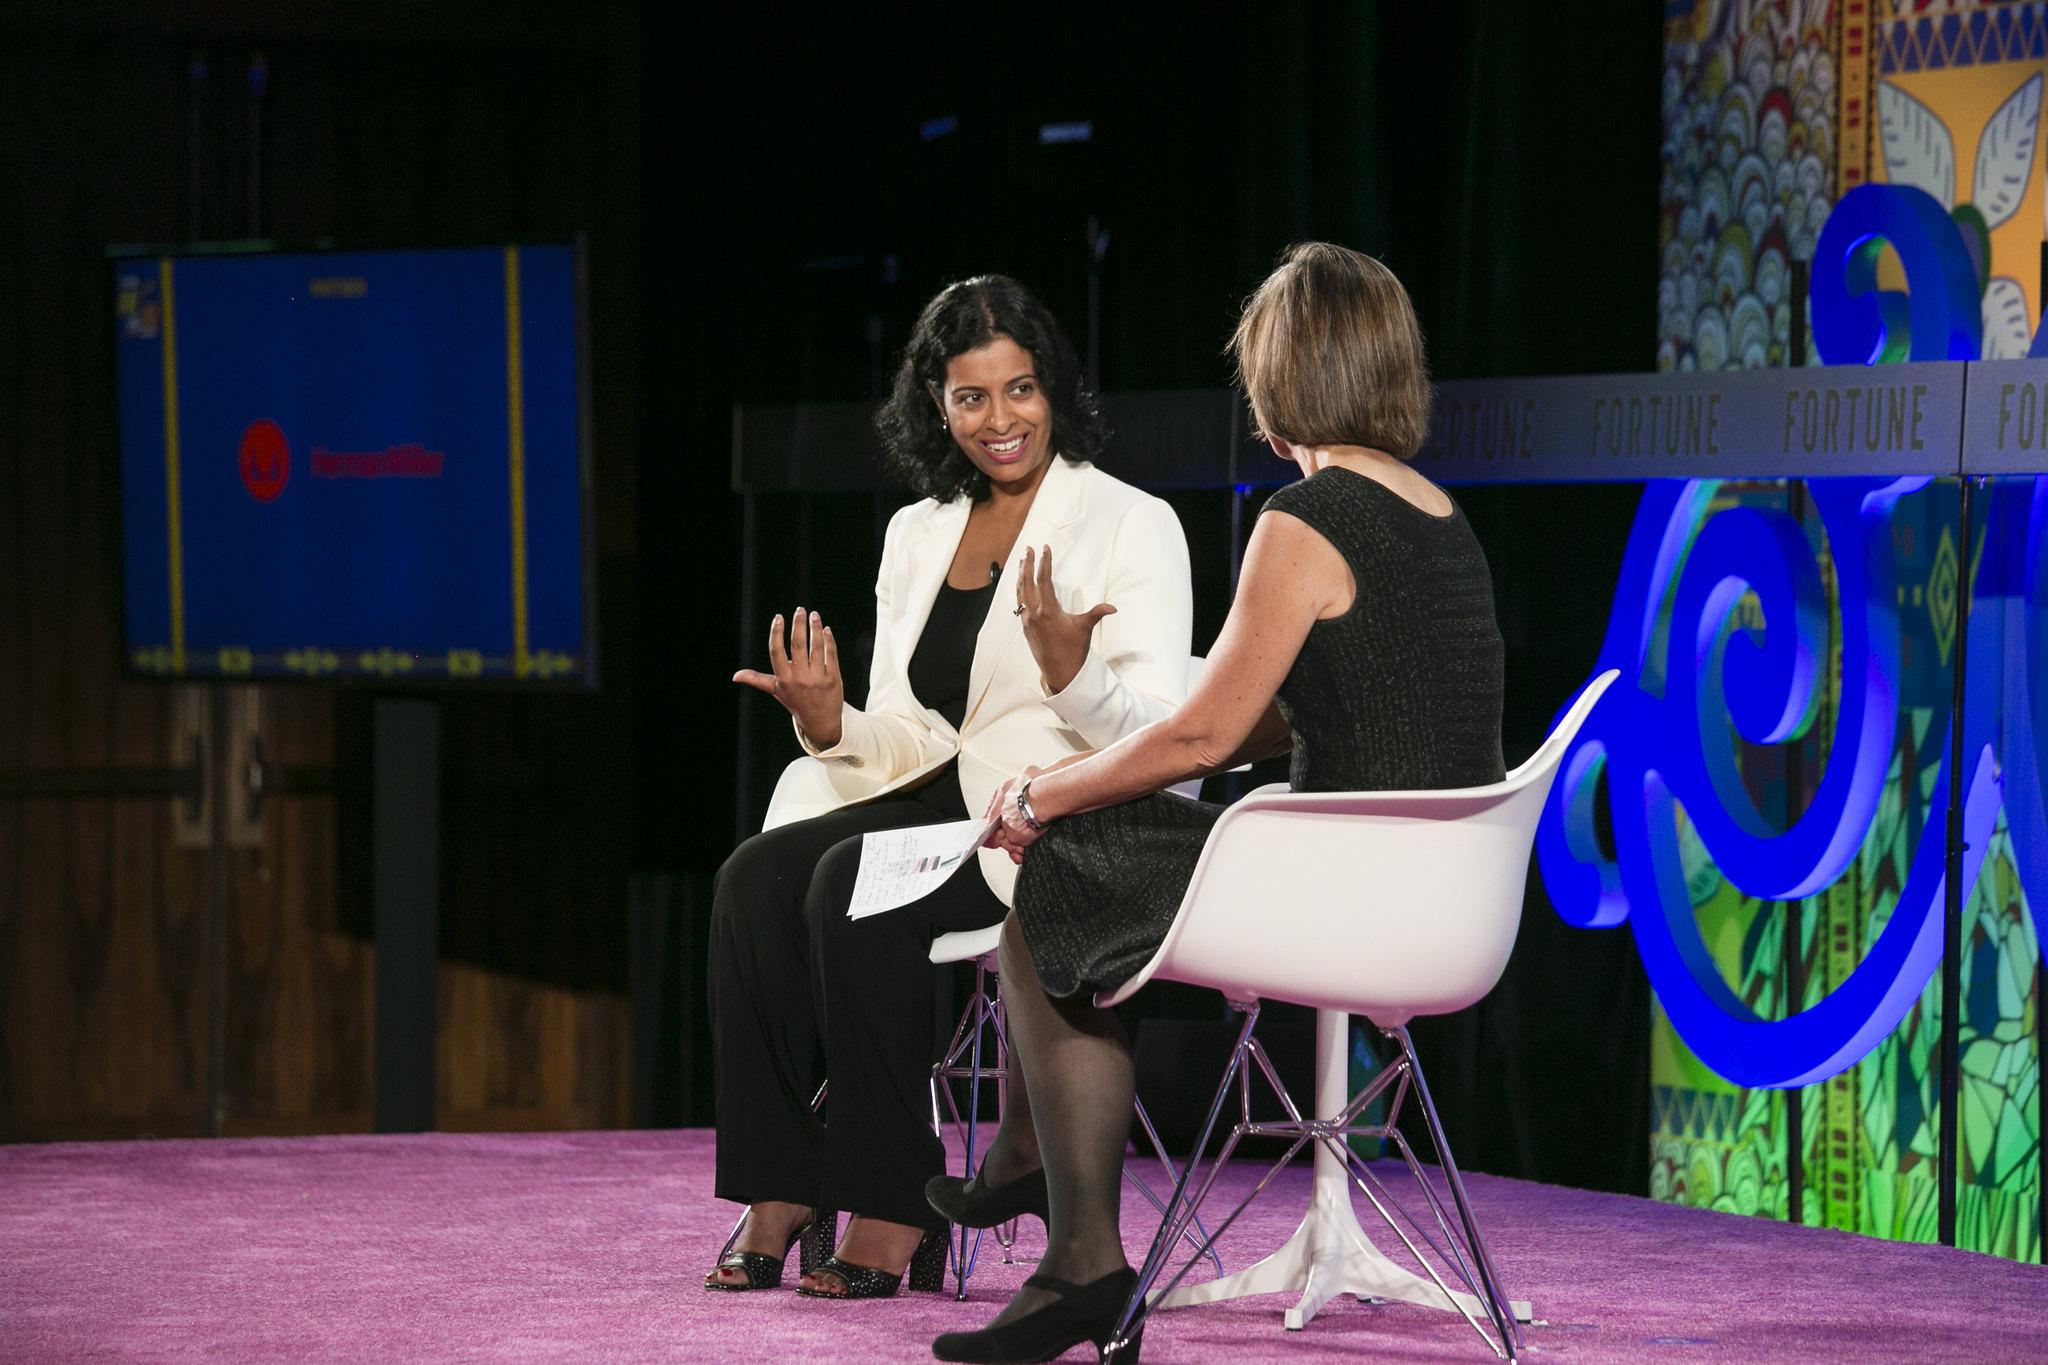 Neela Montgomery, CEO of Crate & Barrel, at MPW International Summit